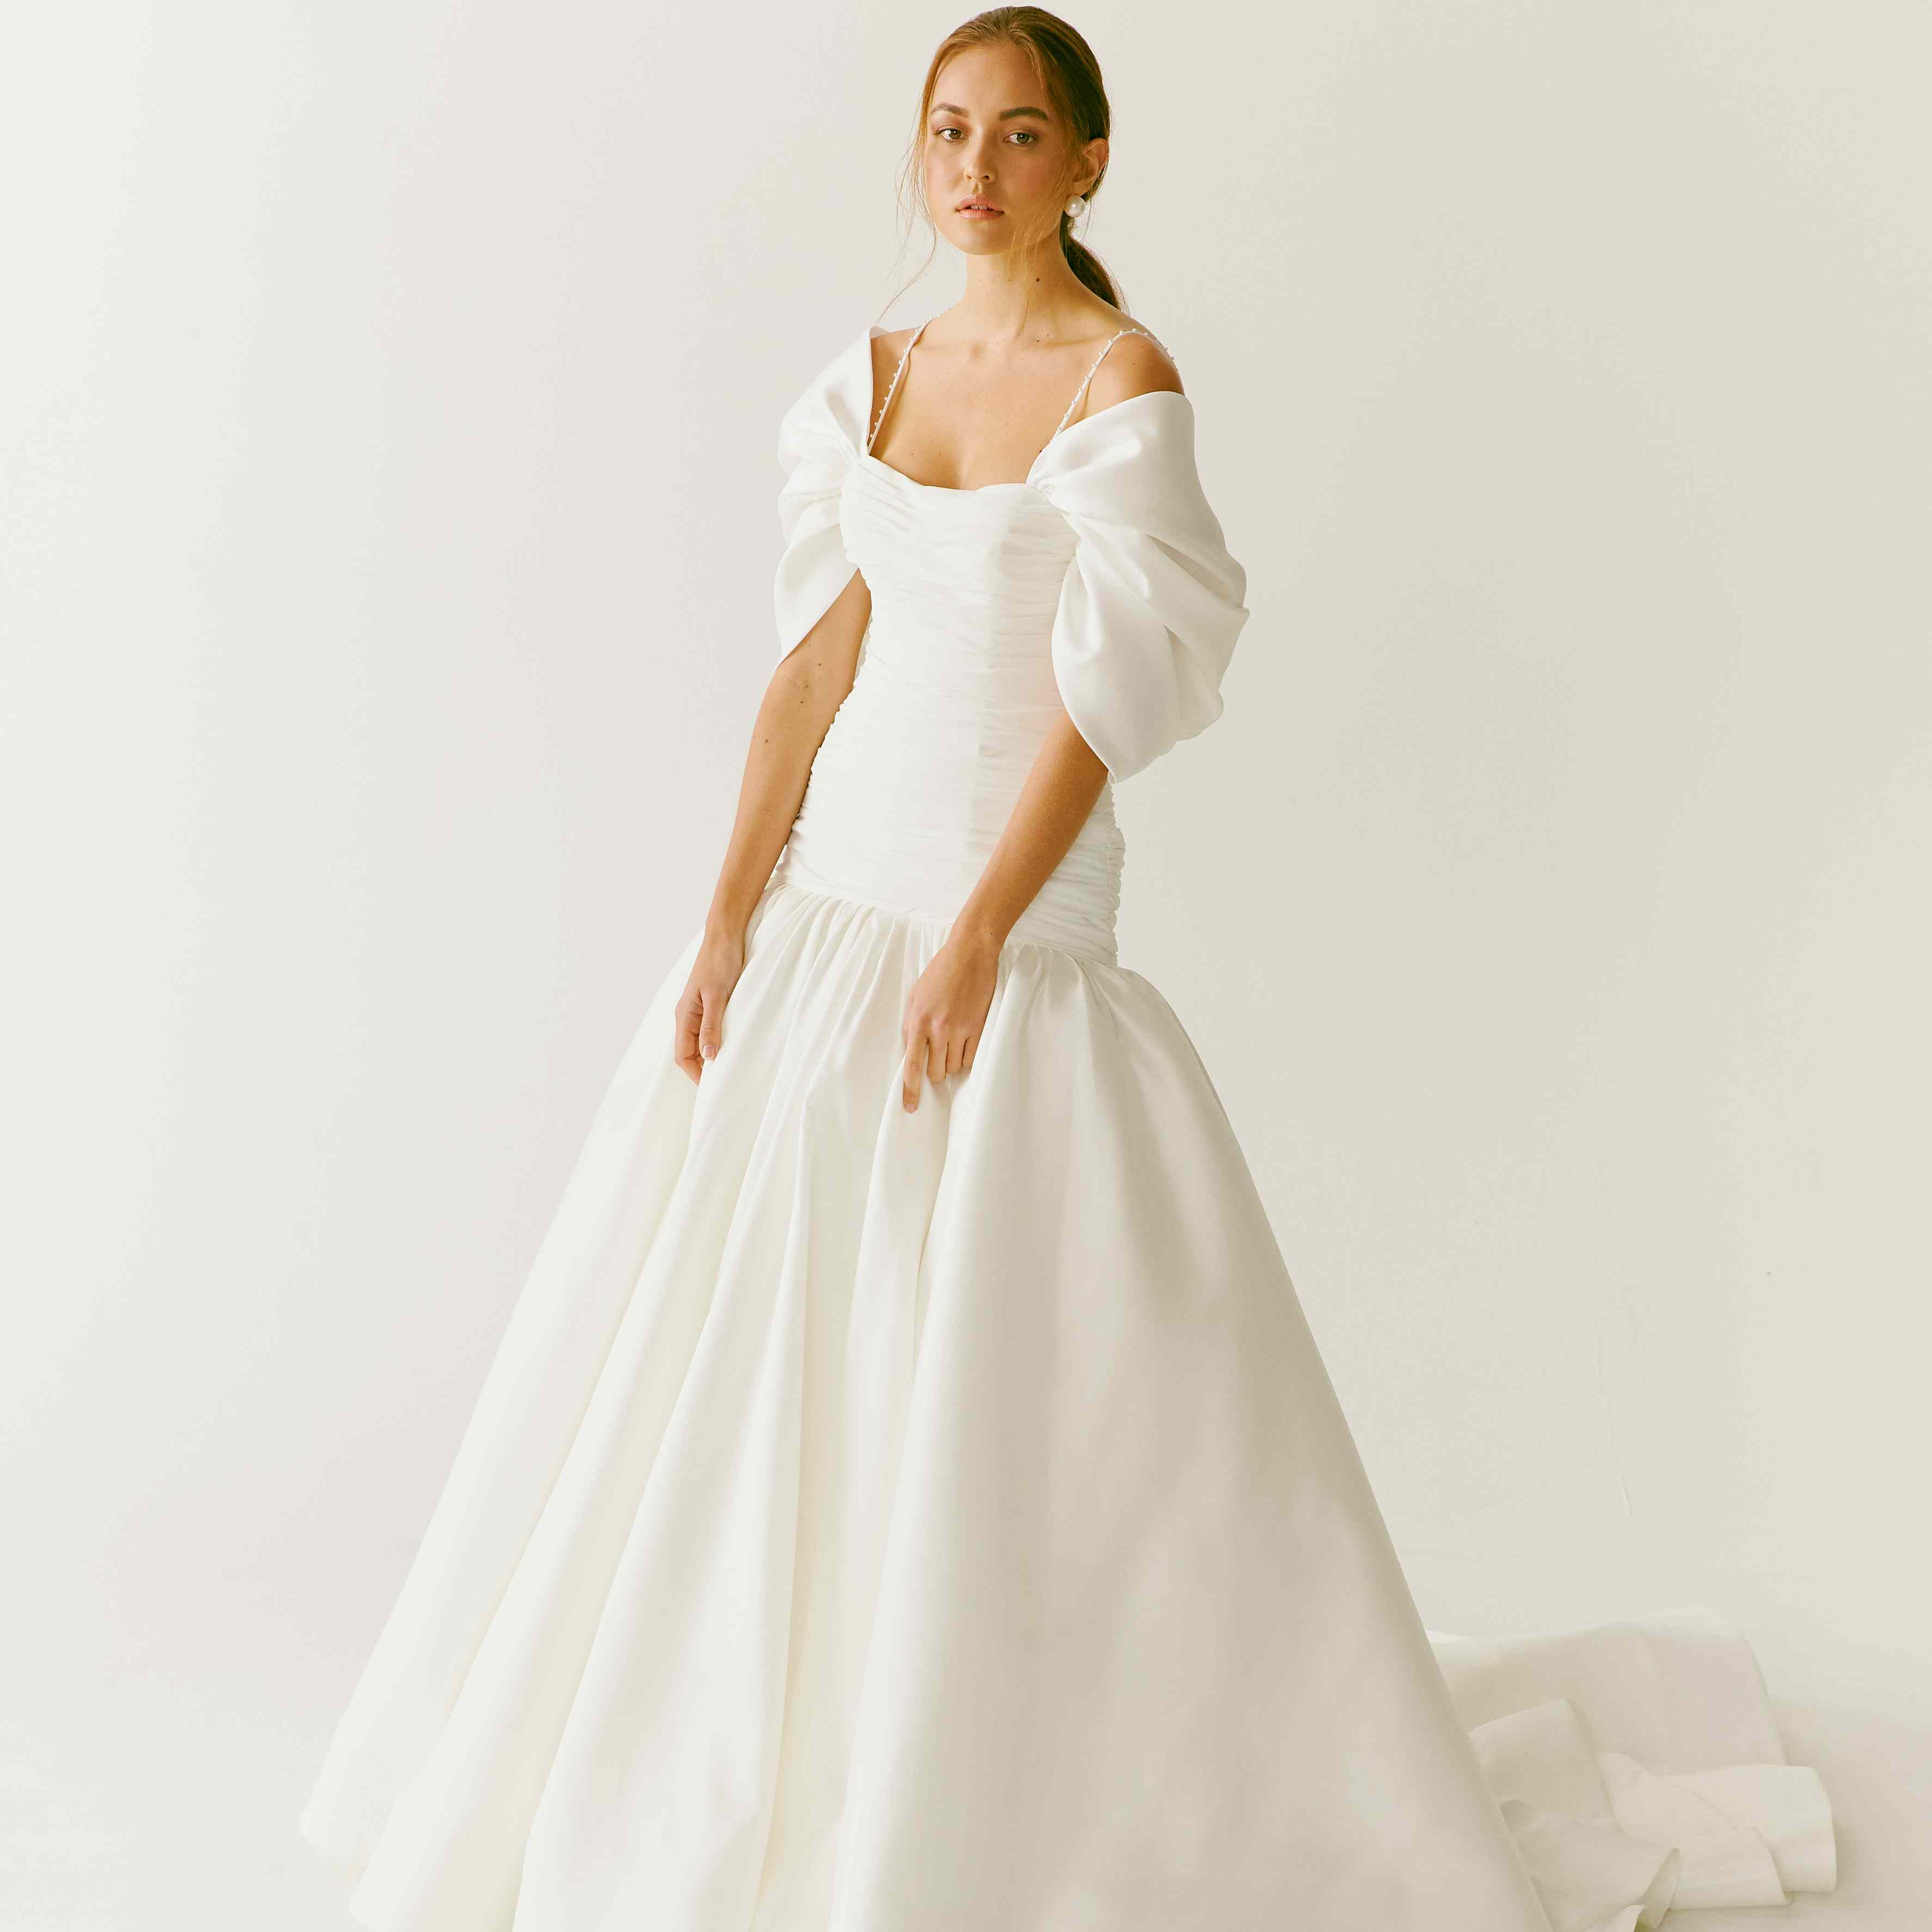 Gallery New Mira Zwillinger Wedding Dresses Spring 2019: Sébastien Luke Bridal Spring 2020